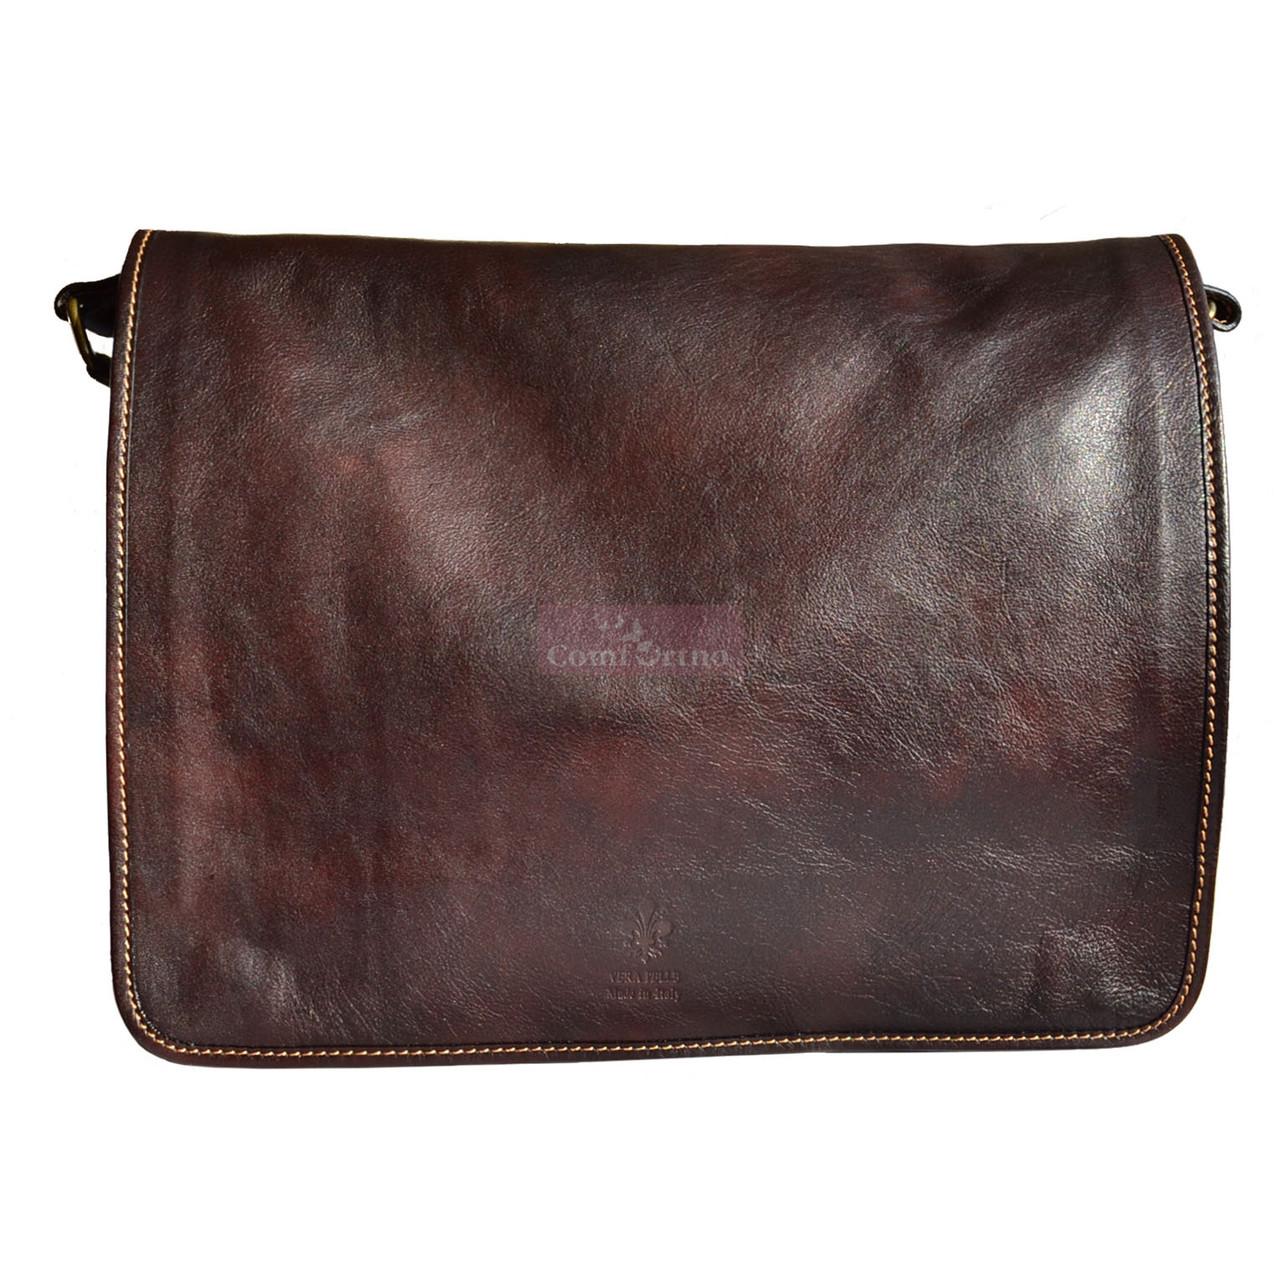 2ad381759735 Мужская кожаная сумка-мессенджер Italian fabric bags 1034, цена 4 096 грн.,  купить в Киеве — Prom.ua (ID#882674877)